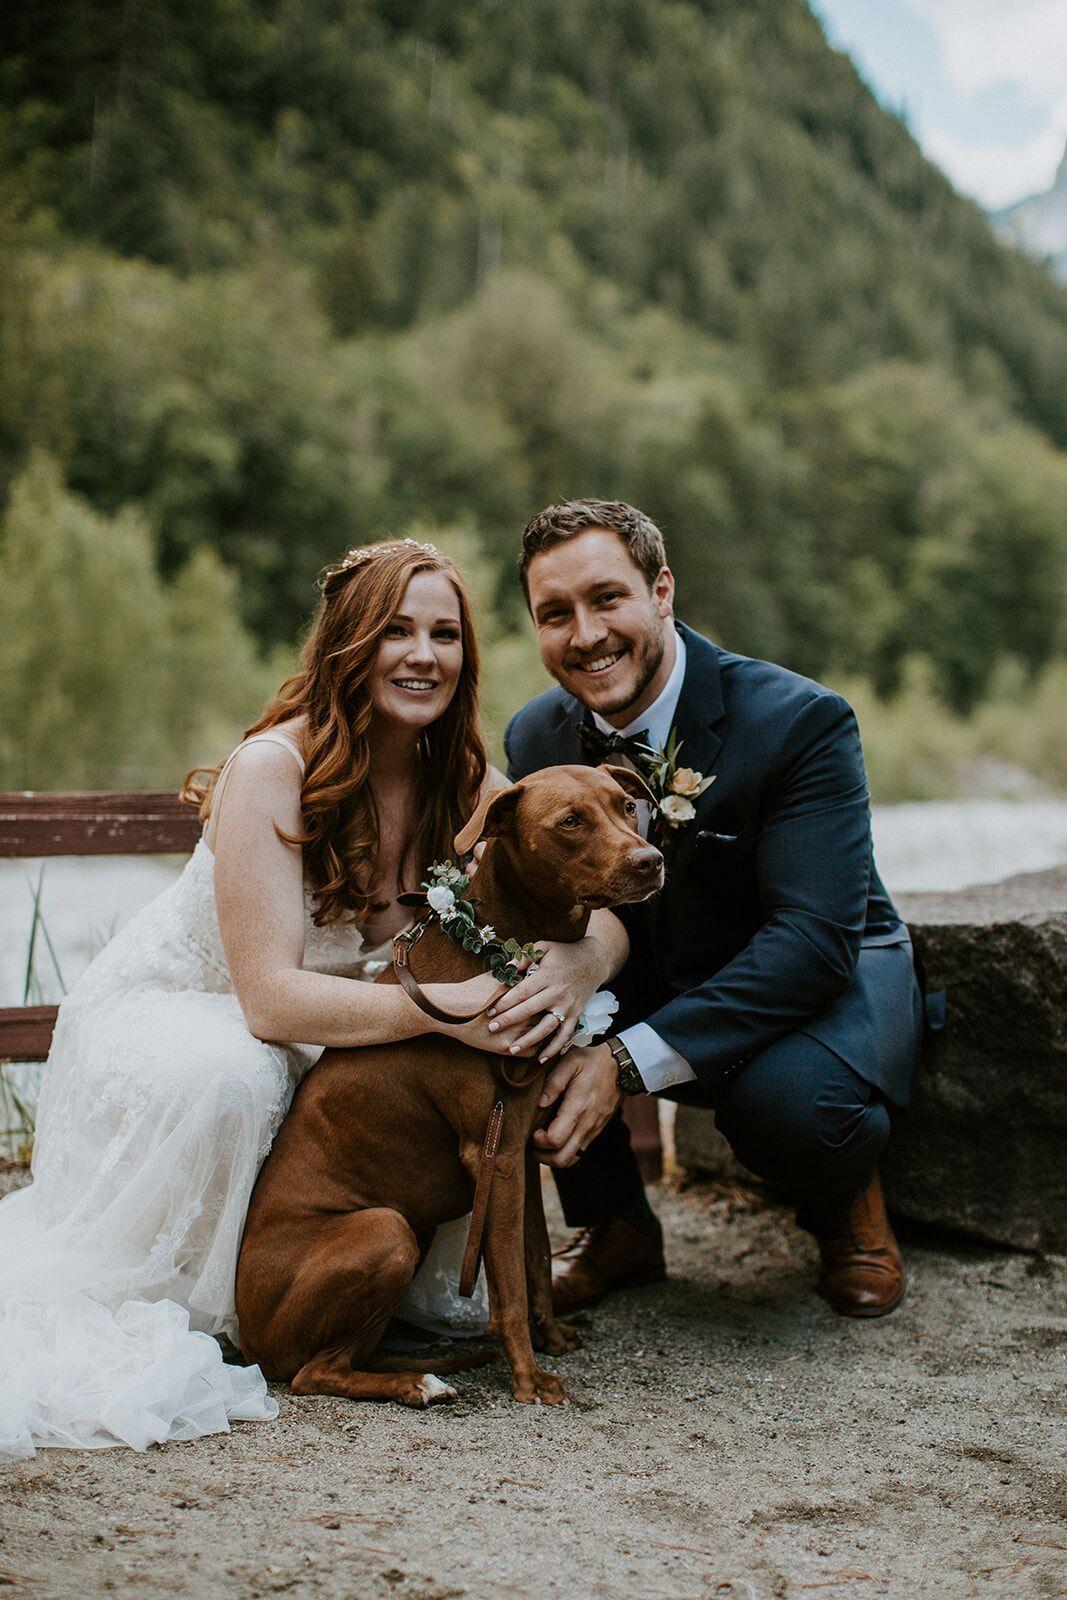 Blue-Sky-Ranch-Wedding-Block-Weddings-and-Events20.jpeg